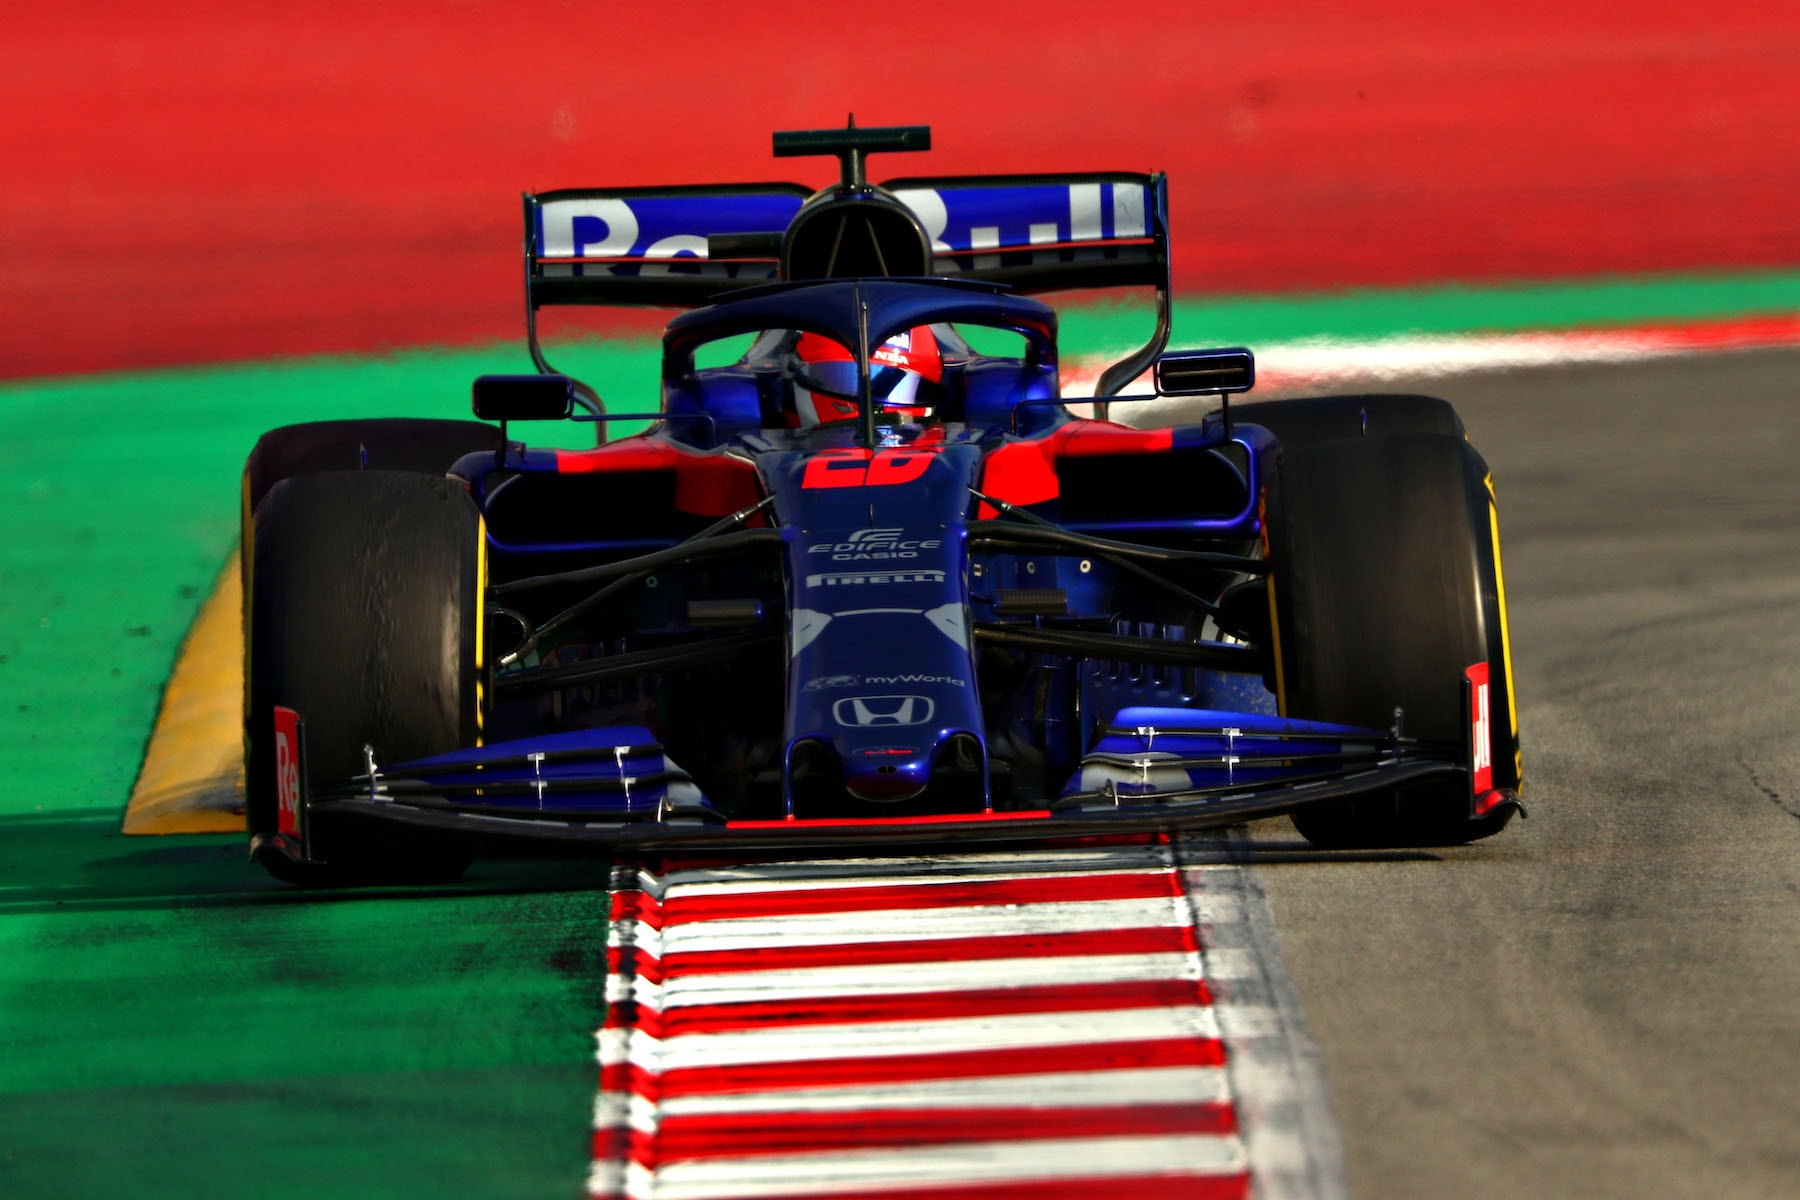 2019 Daniil Kvyat   Toro Rosso STR14   2019 Barcelona T1 D3 2 copy.jpg